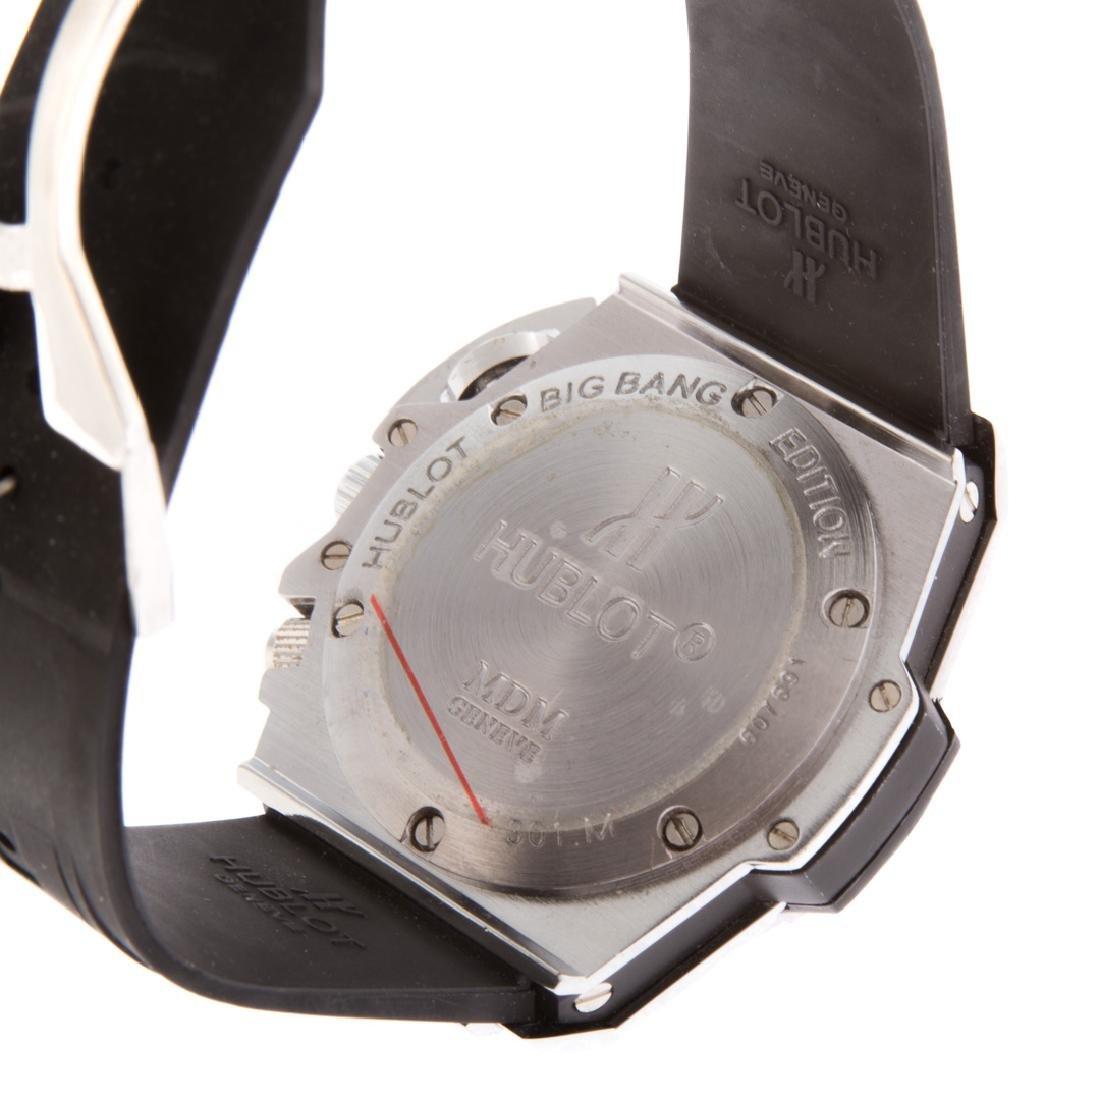 A Gentleman's Hublot Inspired Big Bang Watch - 3